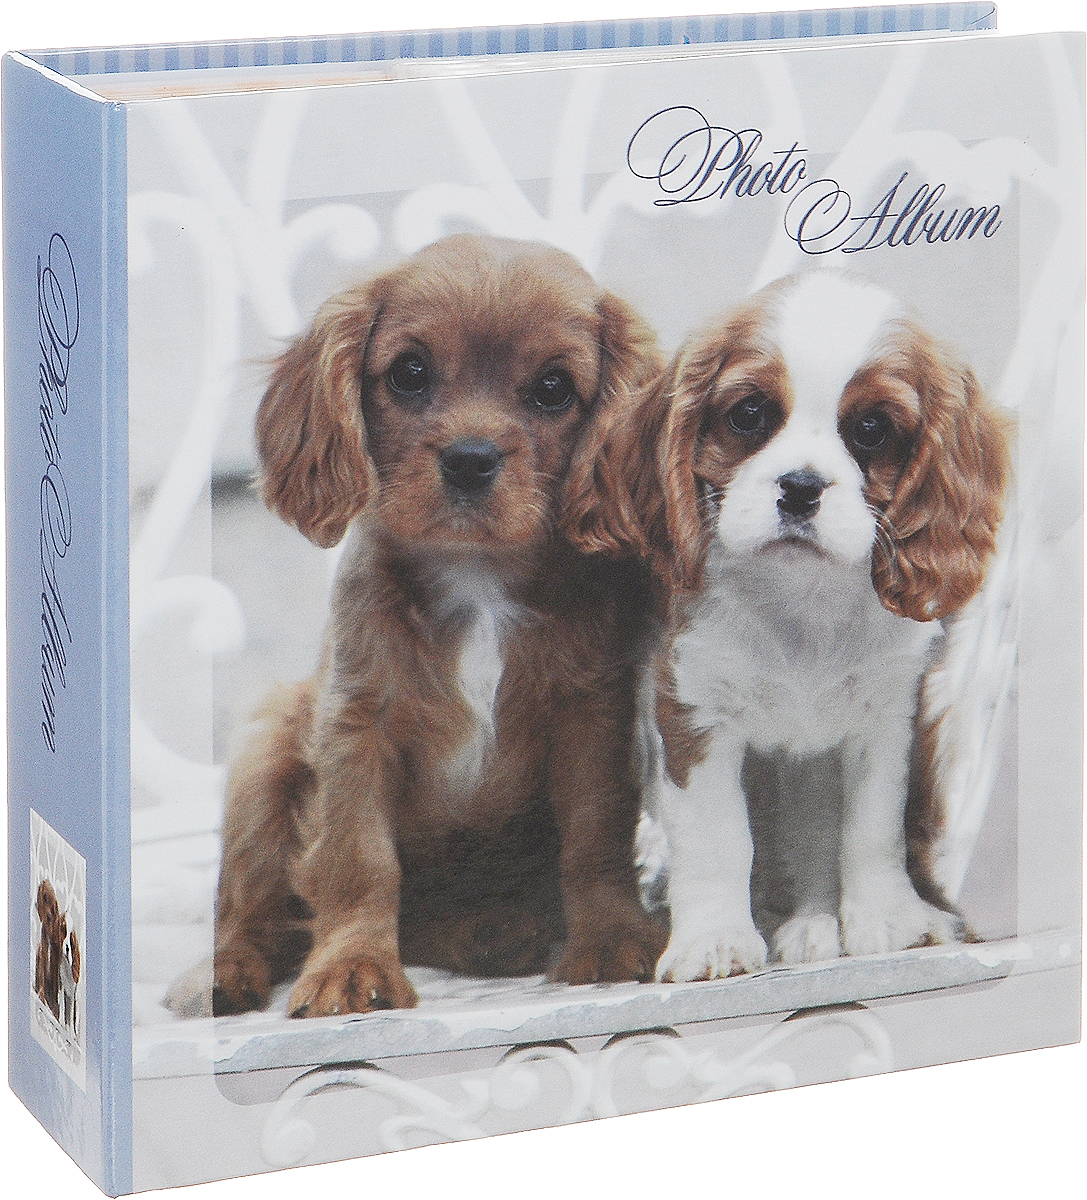 Фотоальбом Pioneer Dogs, 100 фотографий, 10 х 15 см фотоальбом 6171